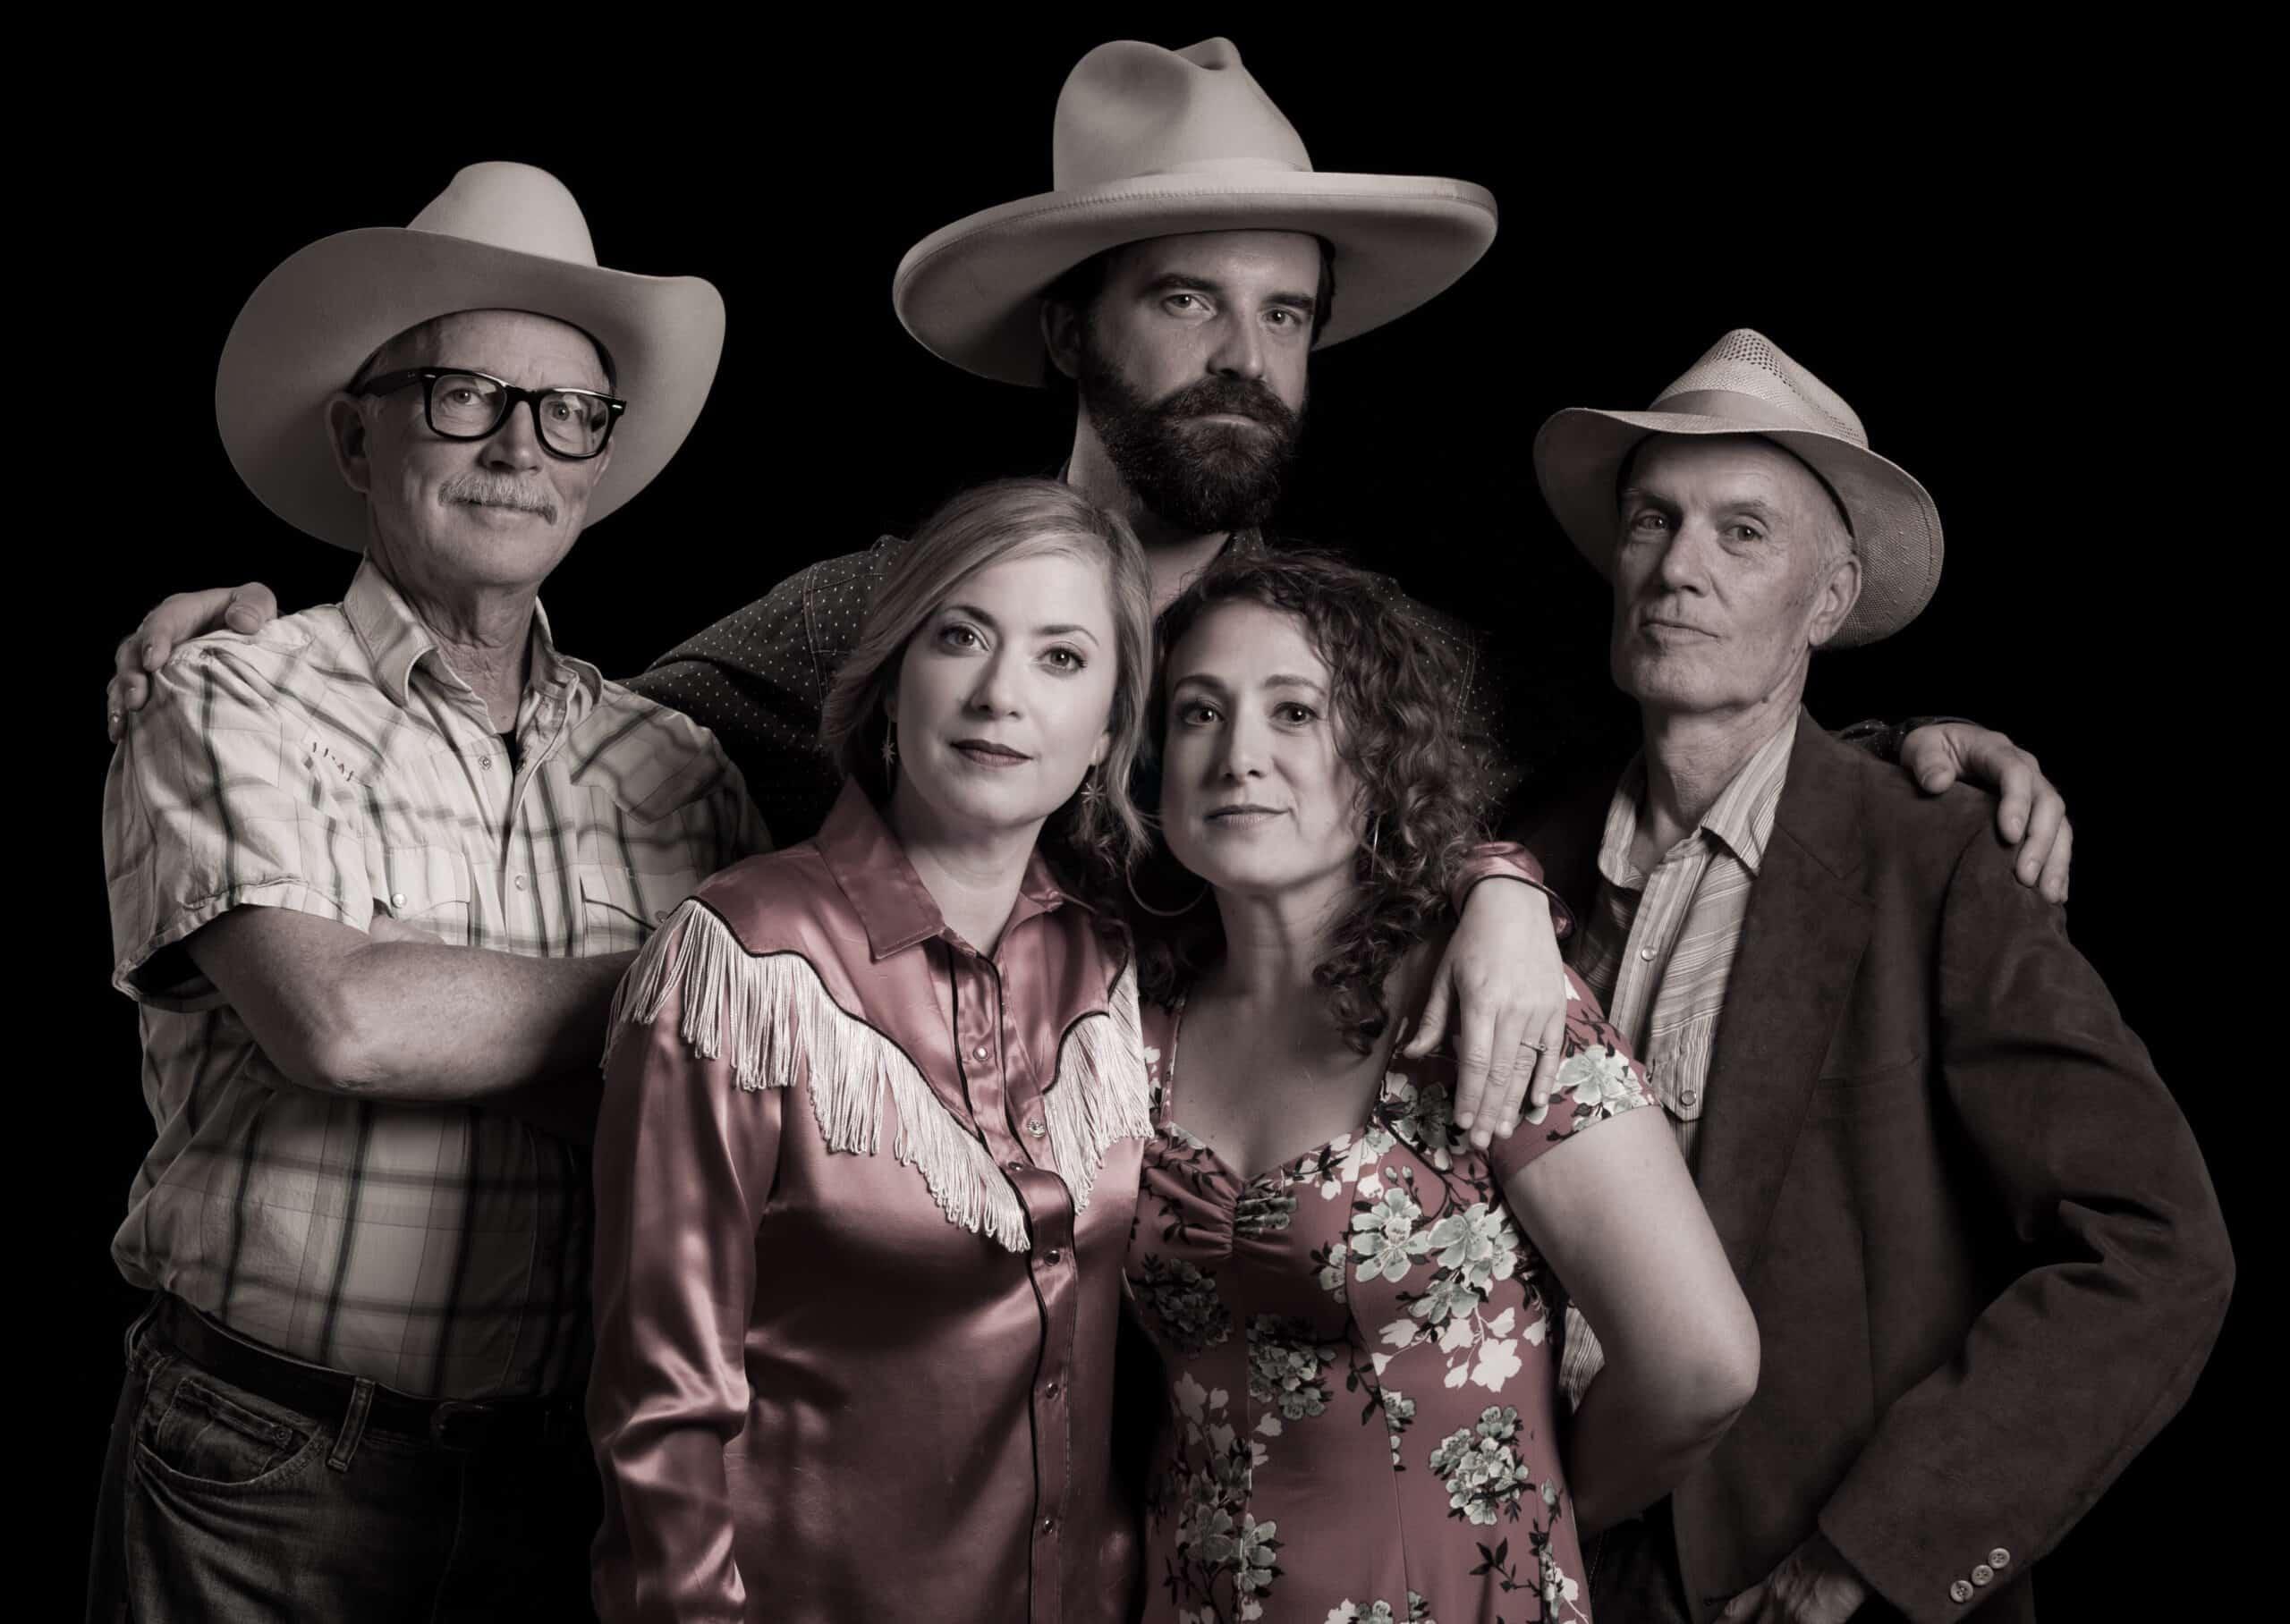 Carolyn Sills Combo, Carolyn, Sills, Combo, Return to El Paso, El Paso